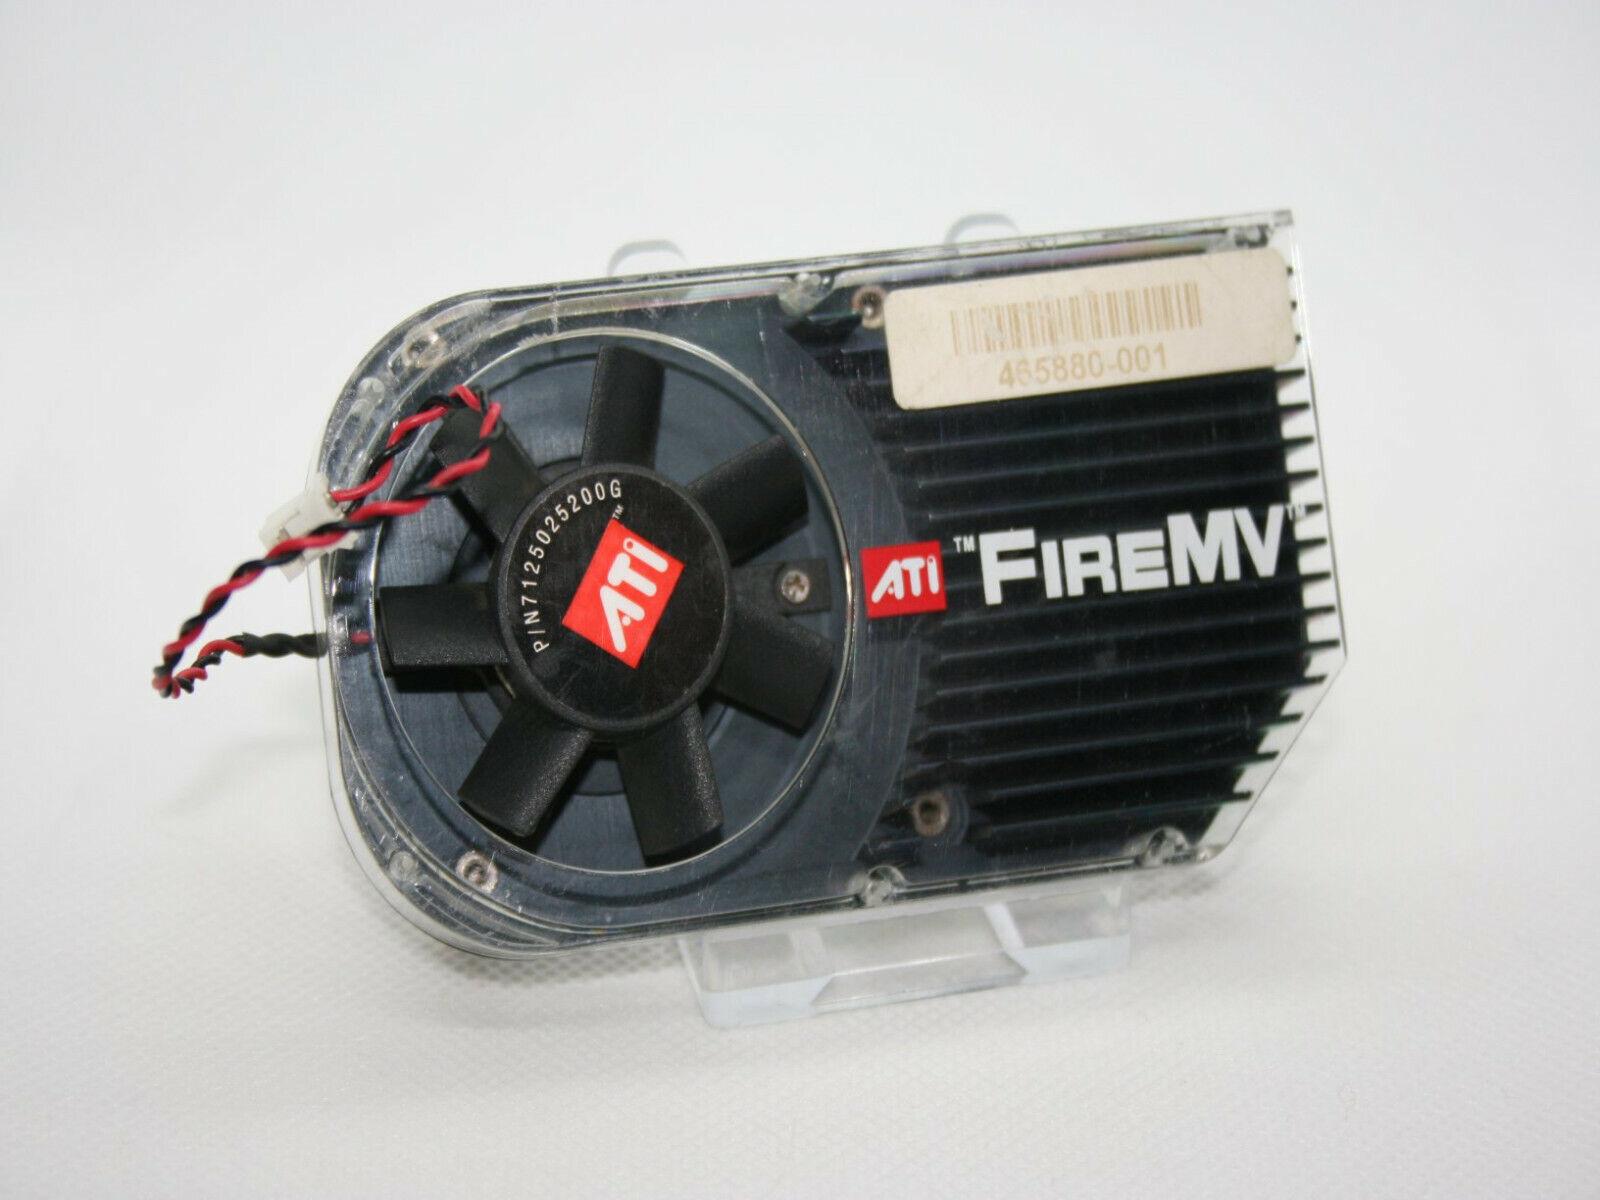 ✔️ ATI HEATSINK AND FAN FOR ATI FireMV 2250 - FULL SET - UK SELLER